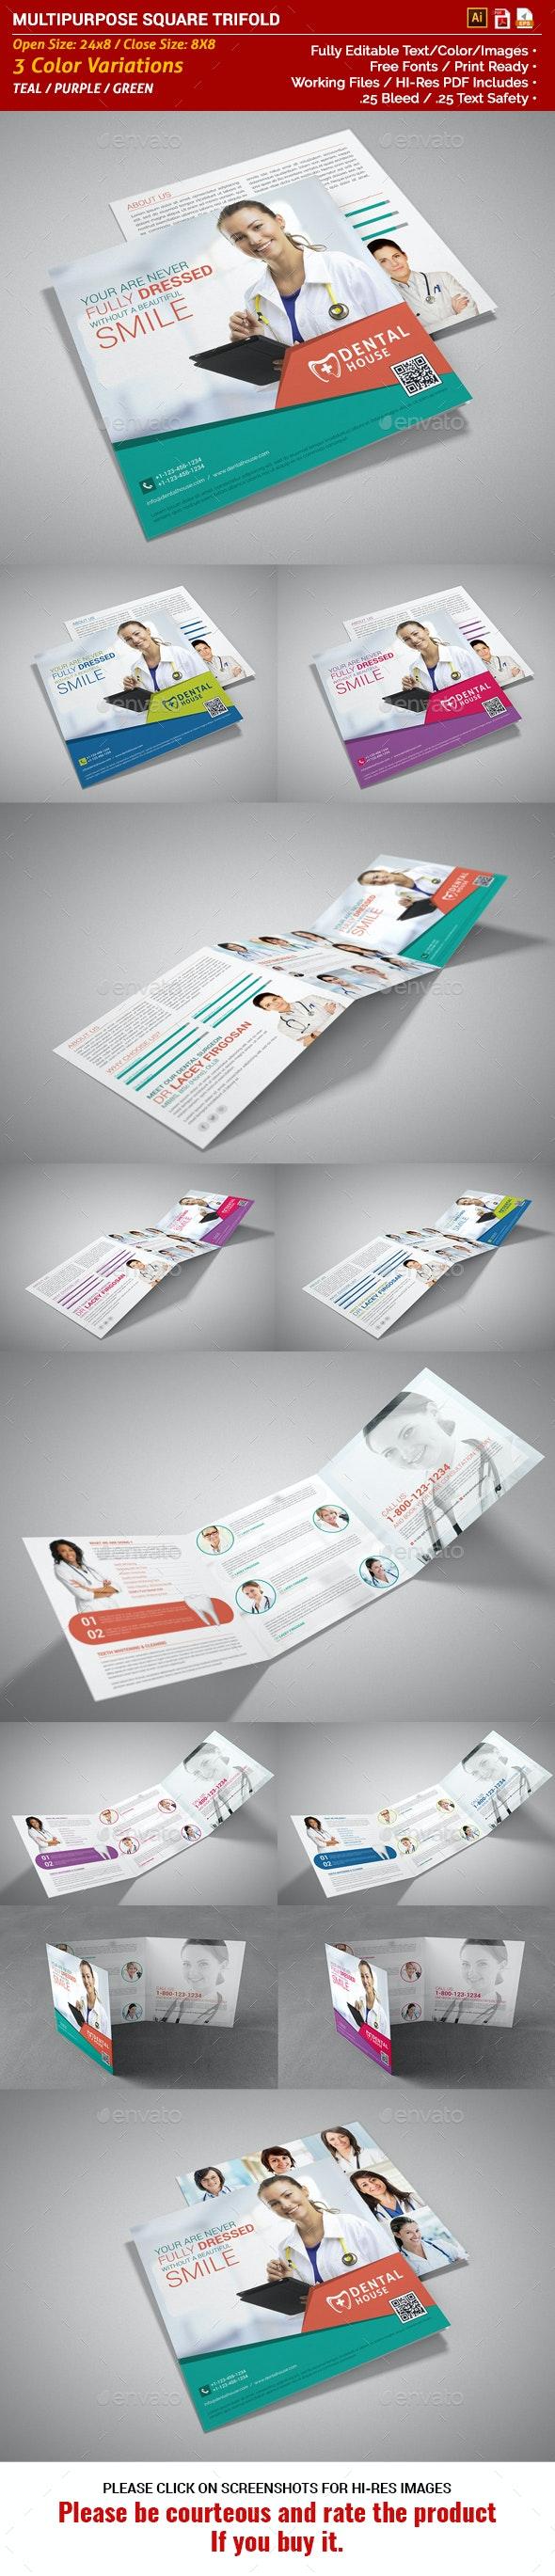 Multipurpose Square Trifold Brochure - Dental - Corporate Brochures